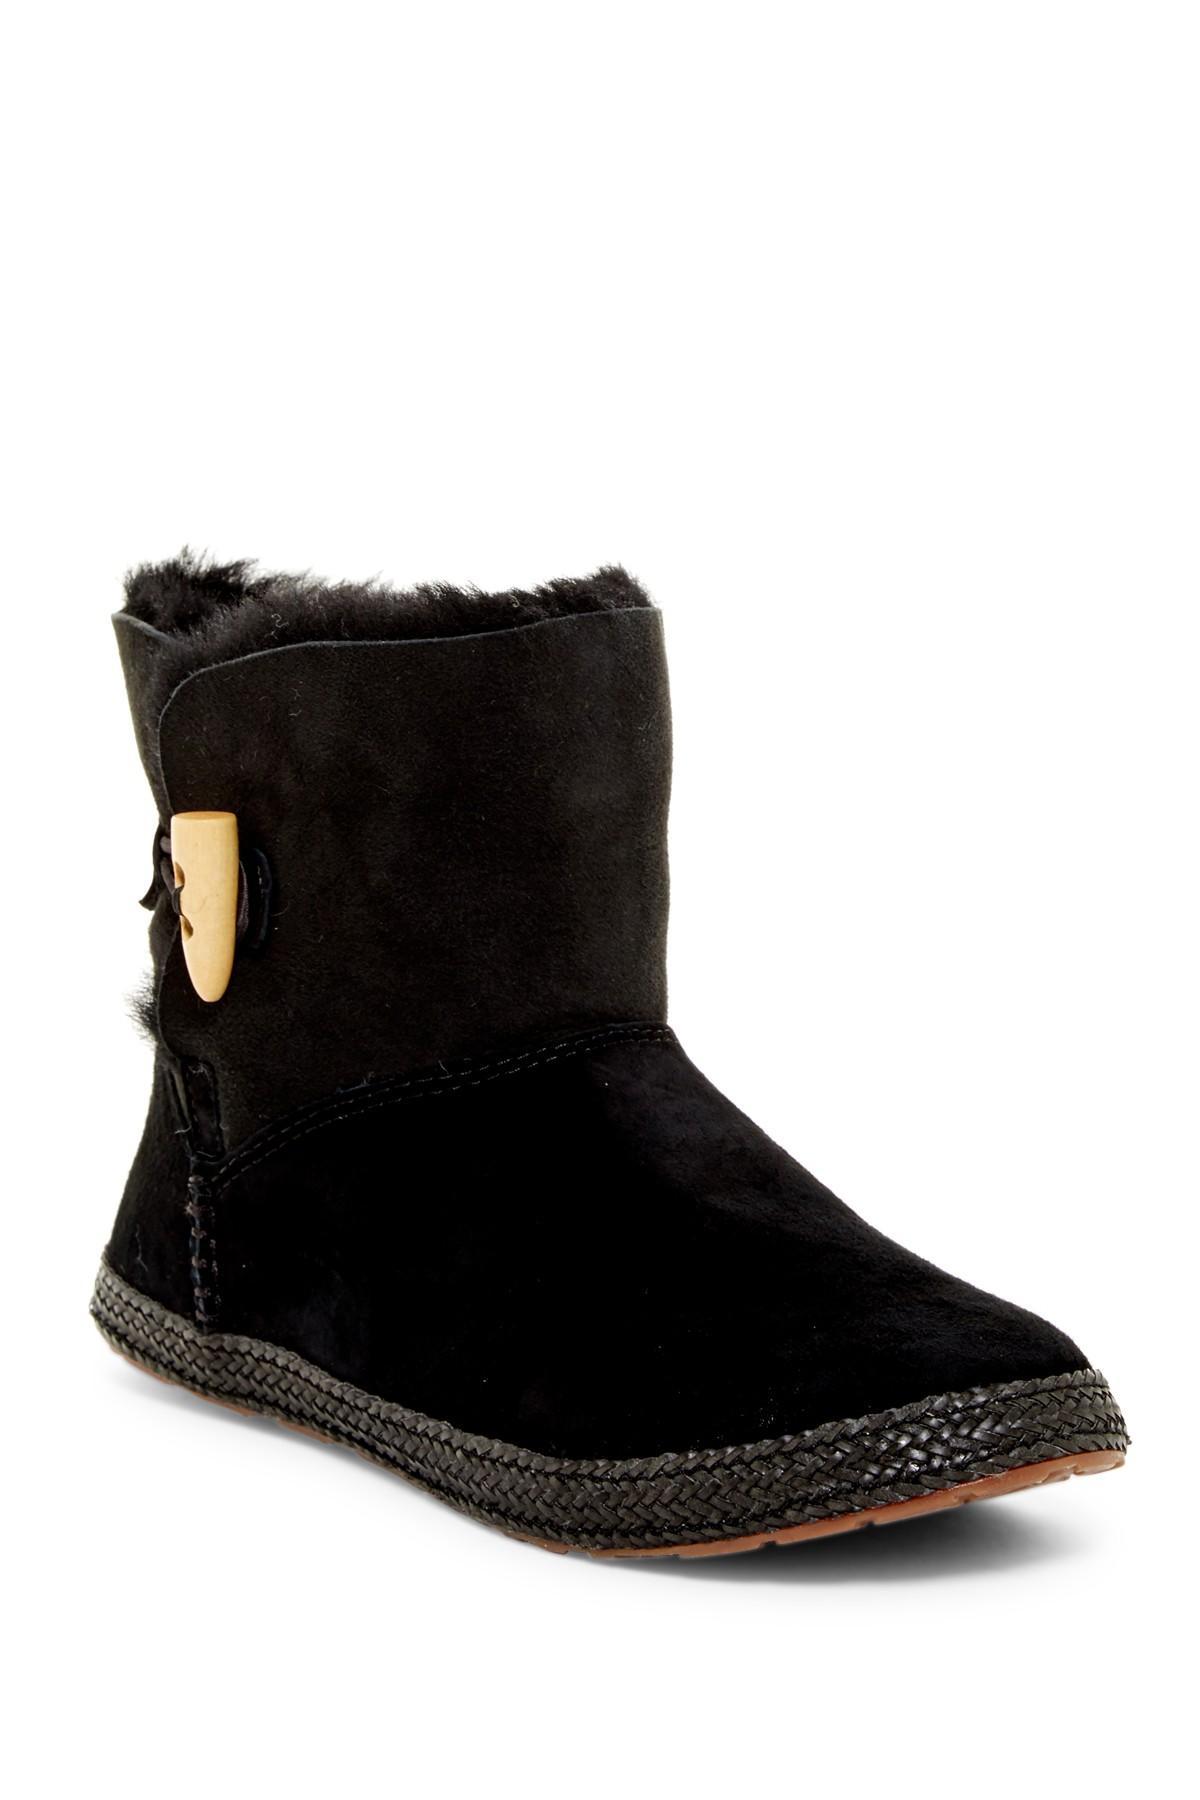 Lyst Ugg Garnet Genuine Shearling Lined Boot In Black